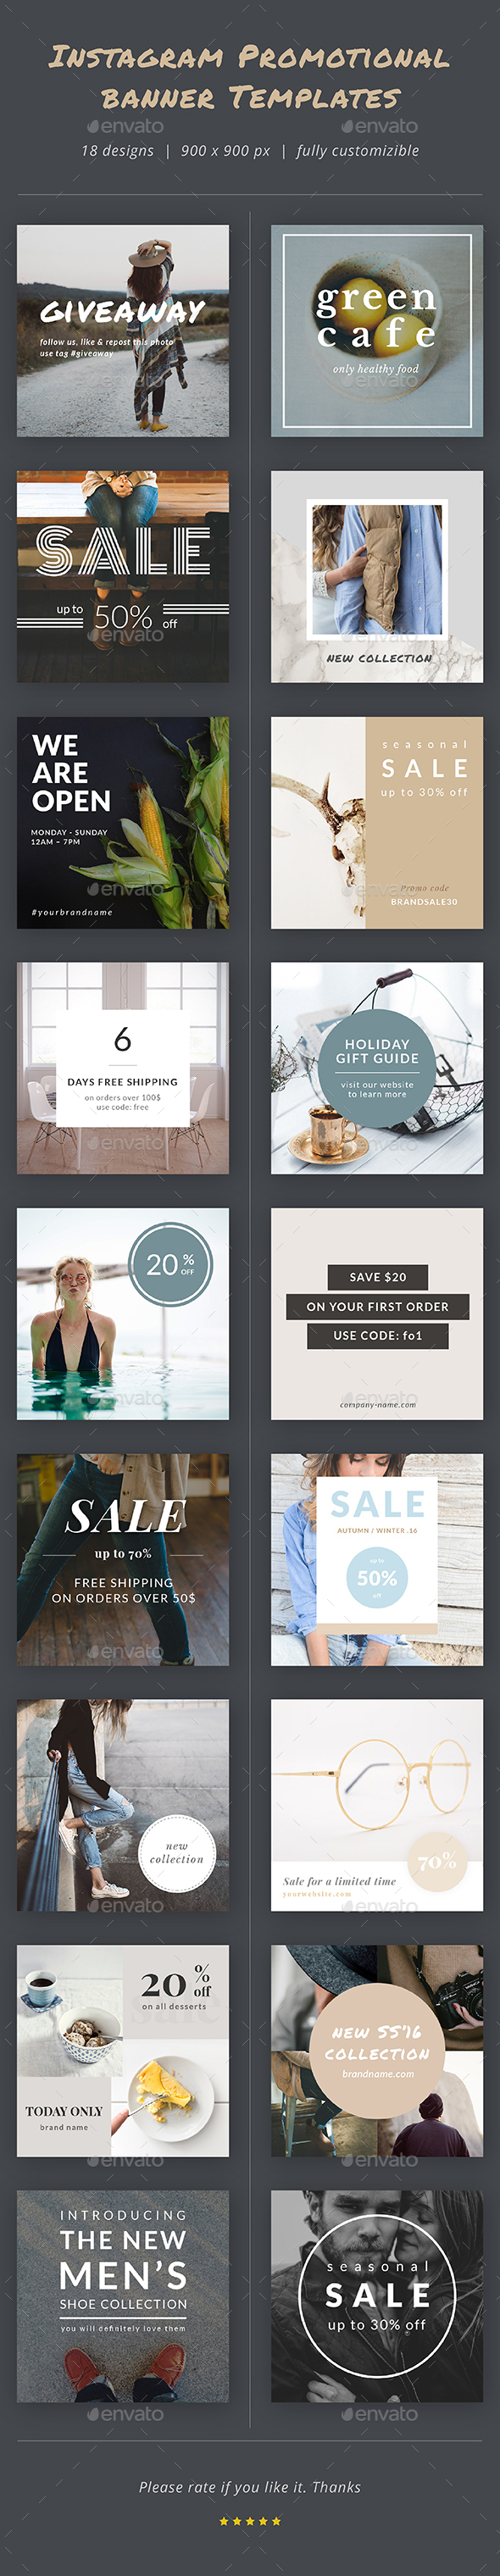 Instagram Promotional Banner Templates - Social Media Web Elements